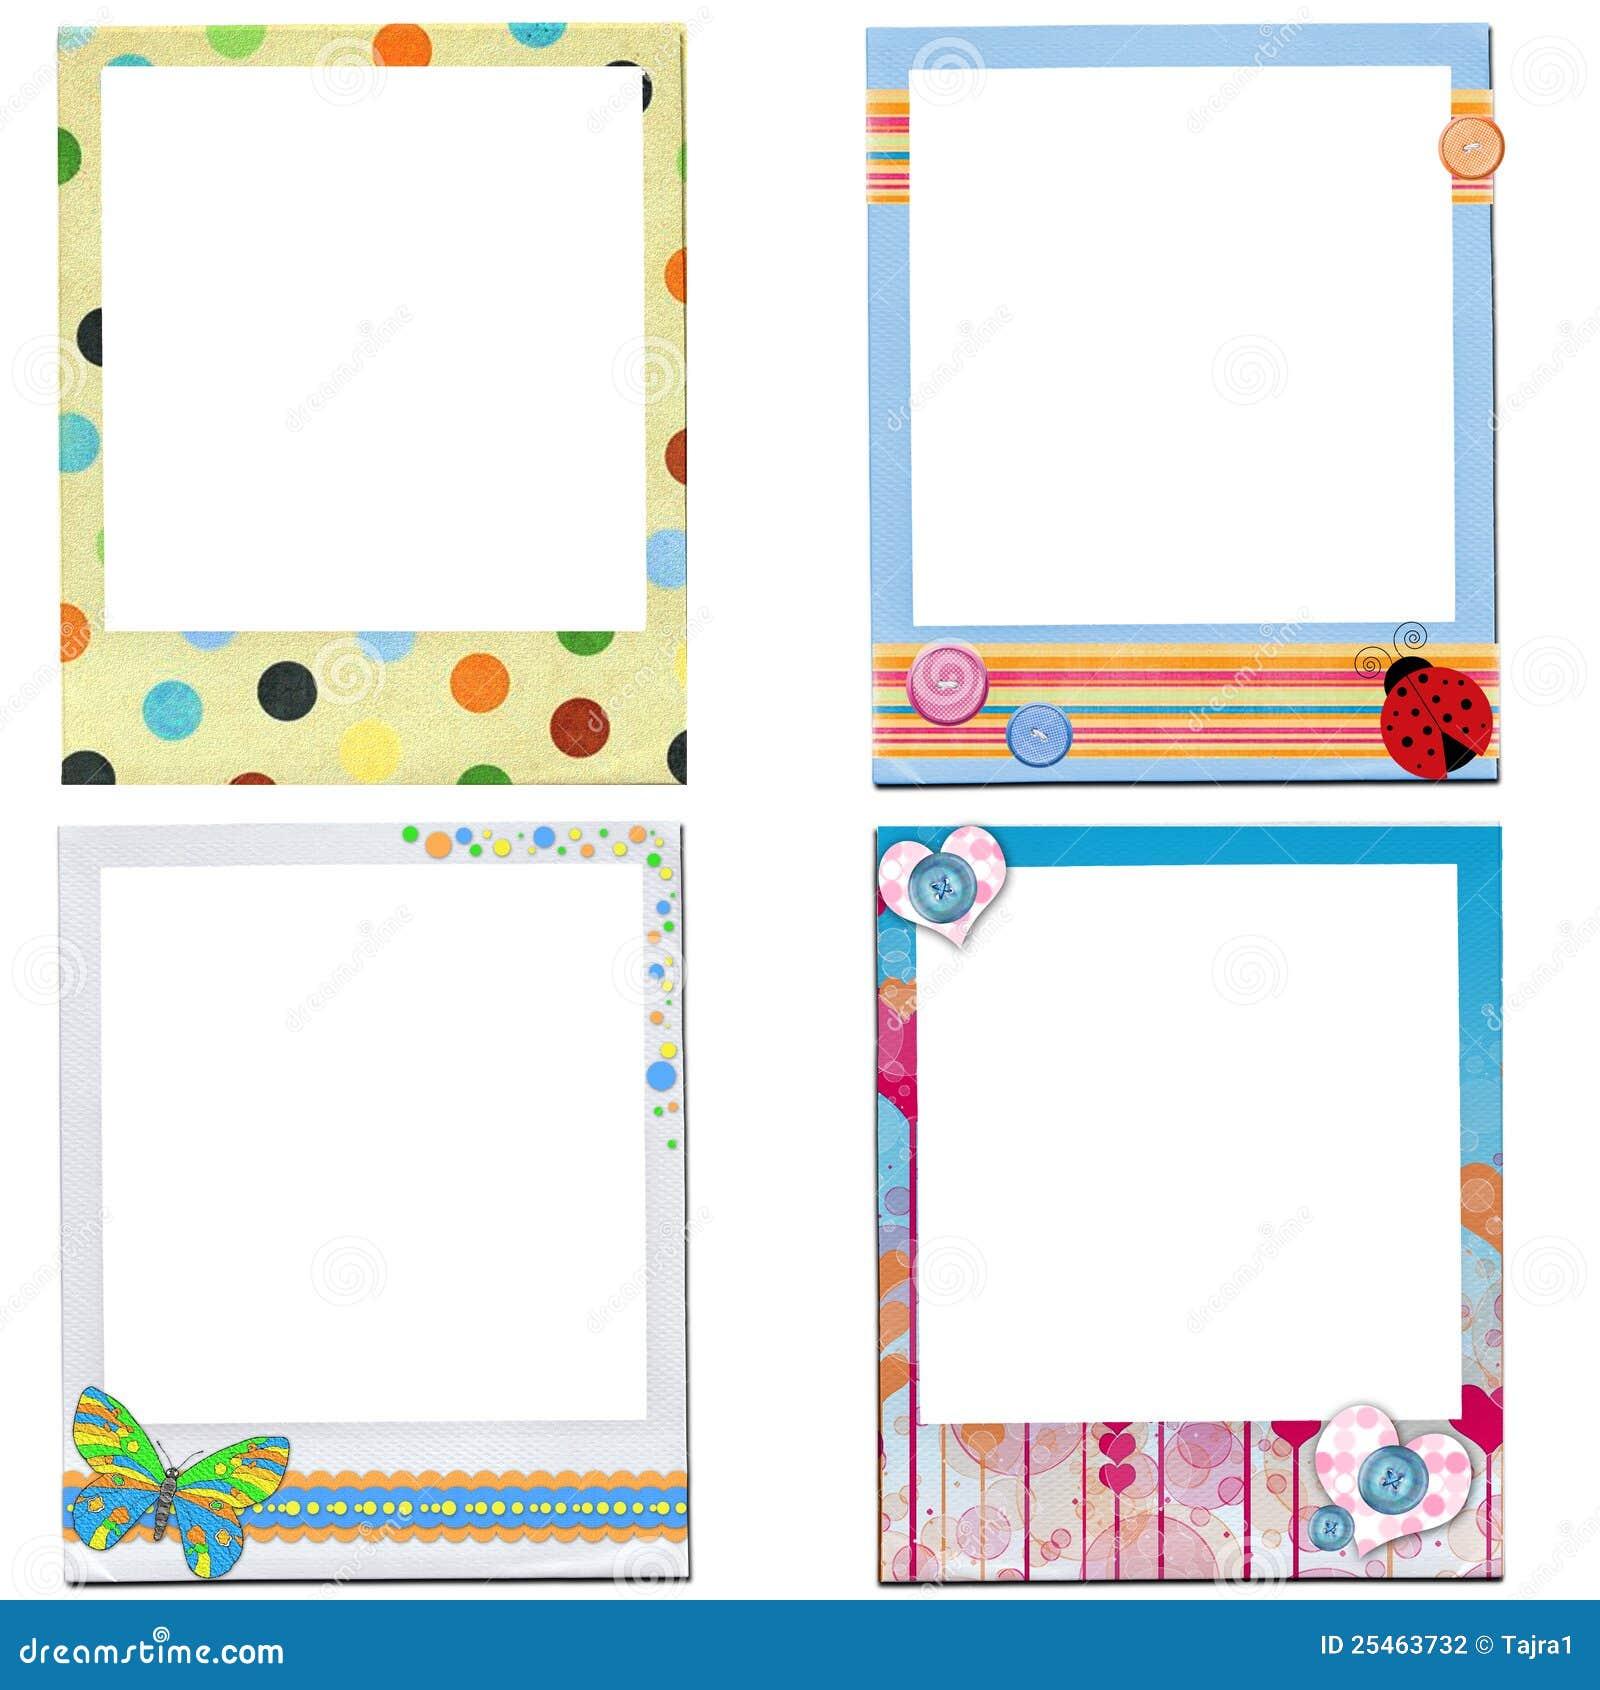 Design Of Kids Photo Frame Stock Illustration - Image ...